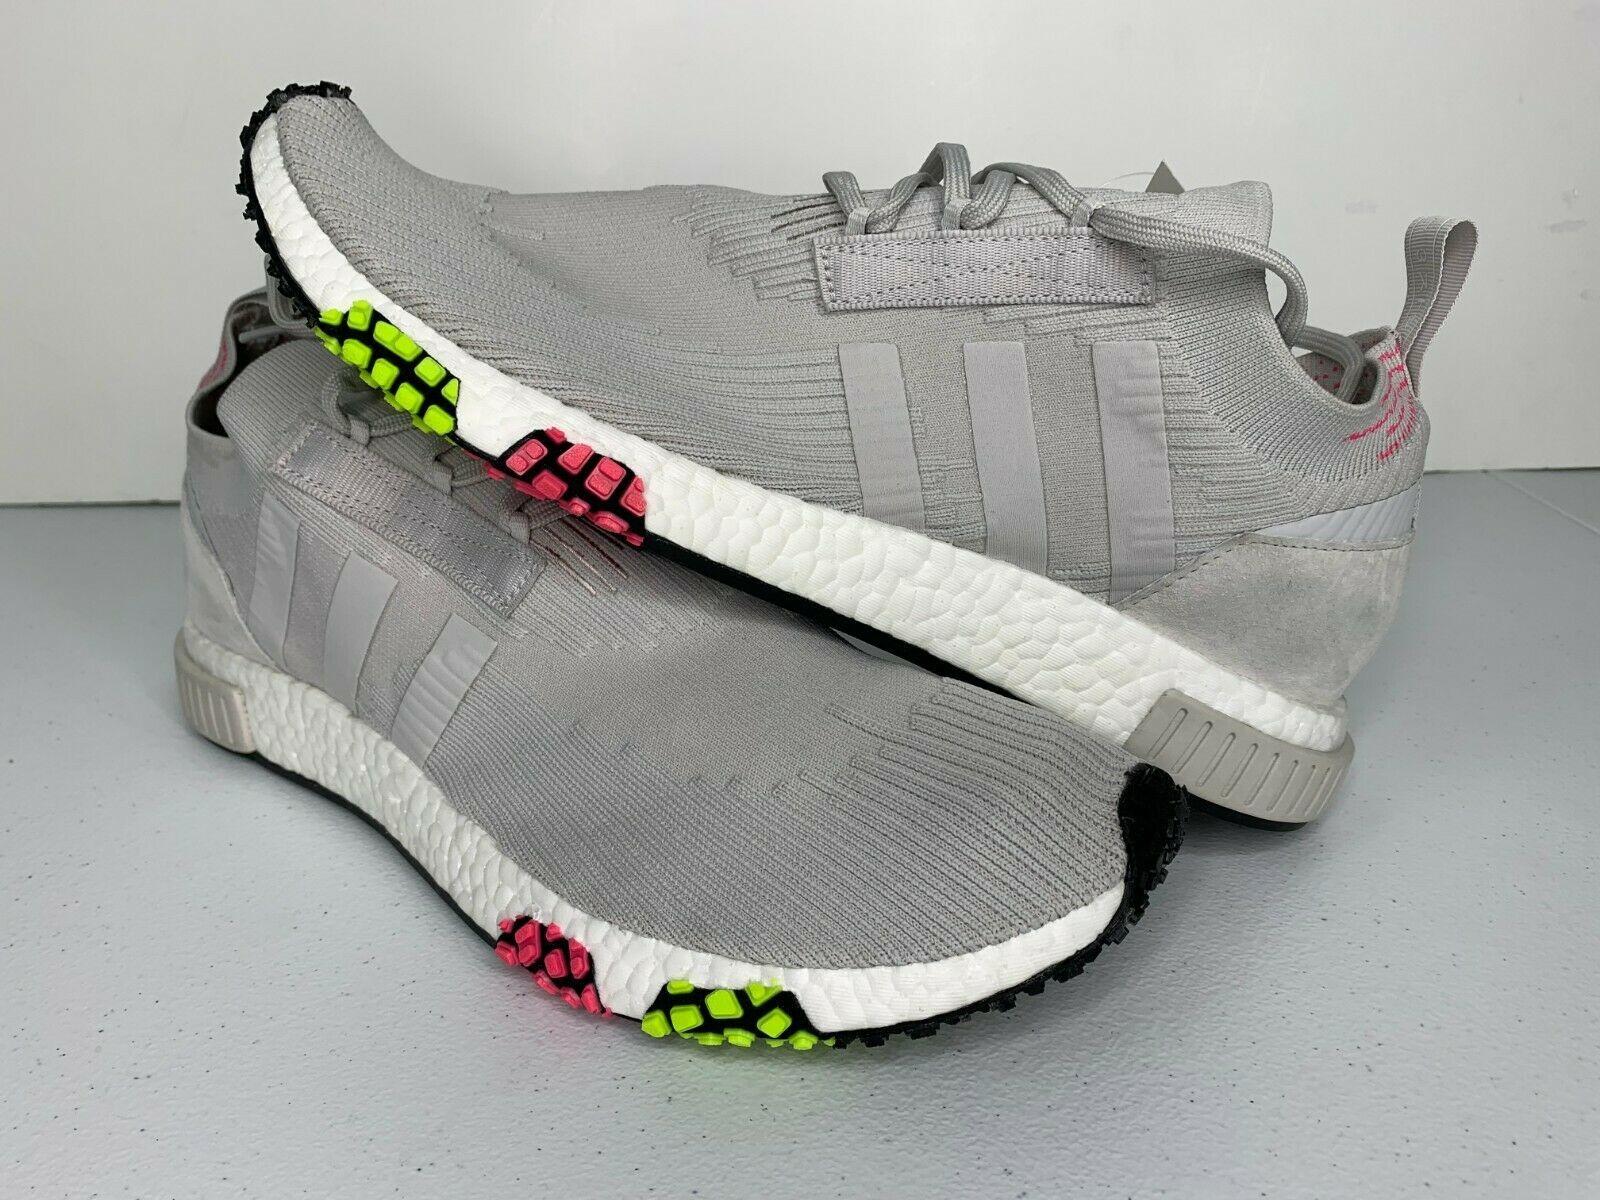 NEW Size 13 Adidas Originals NMD Racer PK and 50 similar items